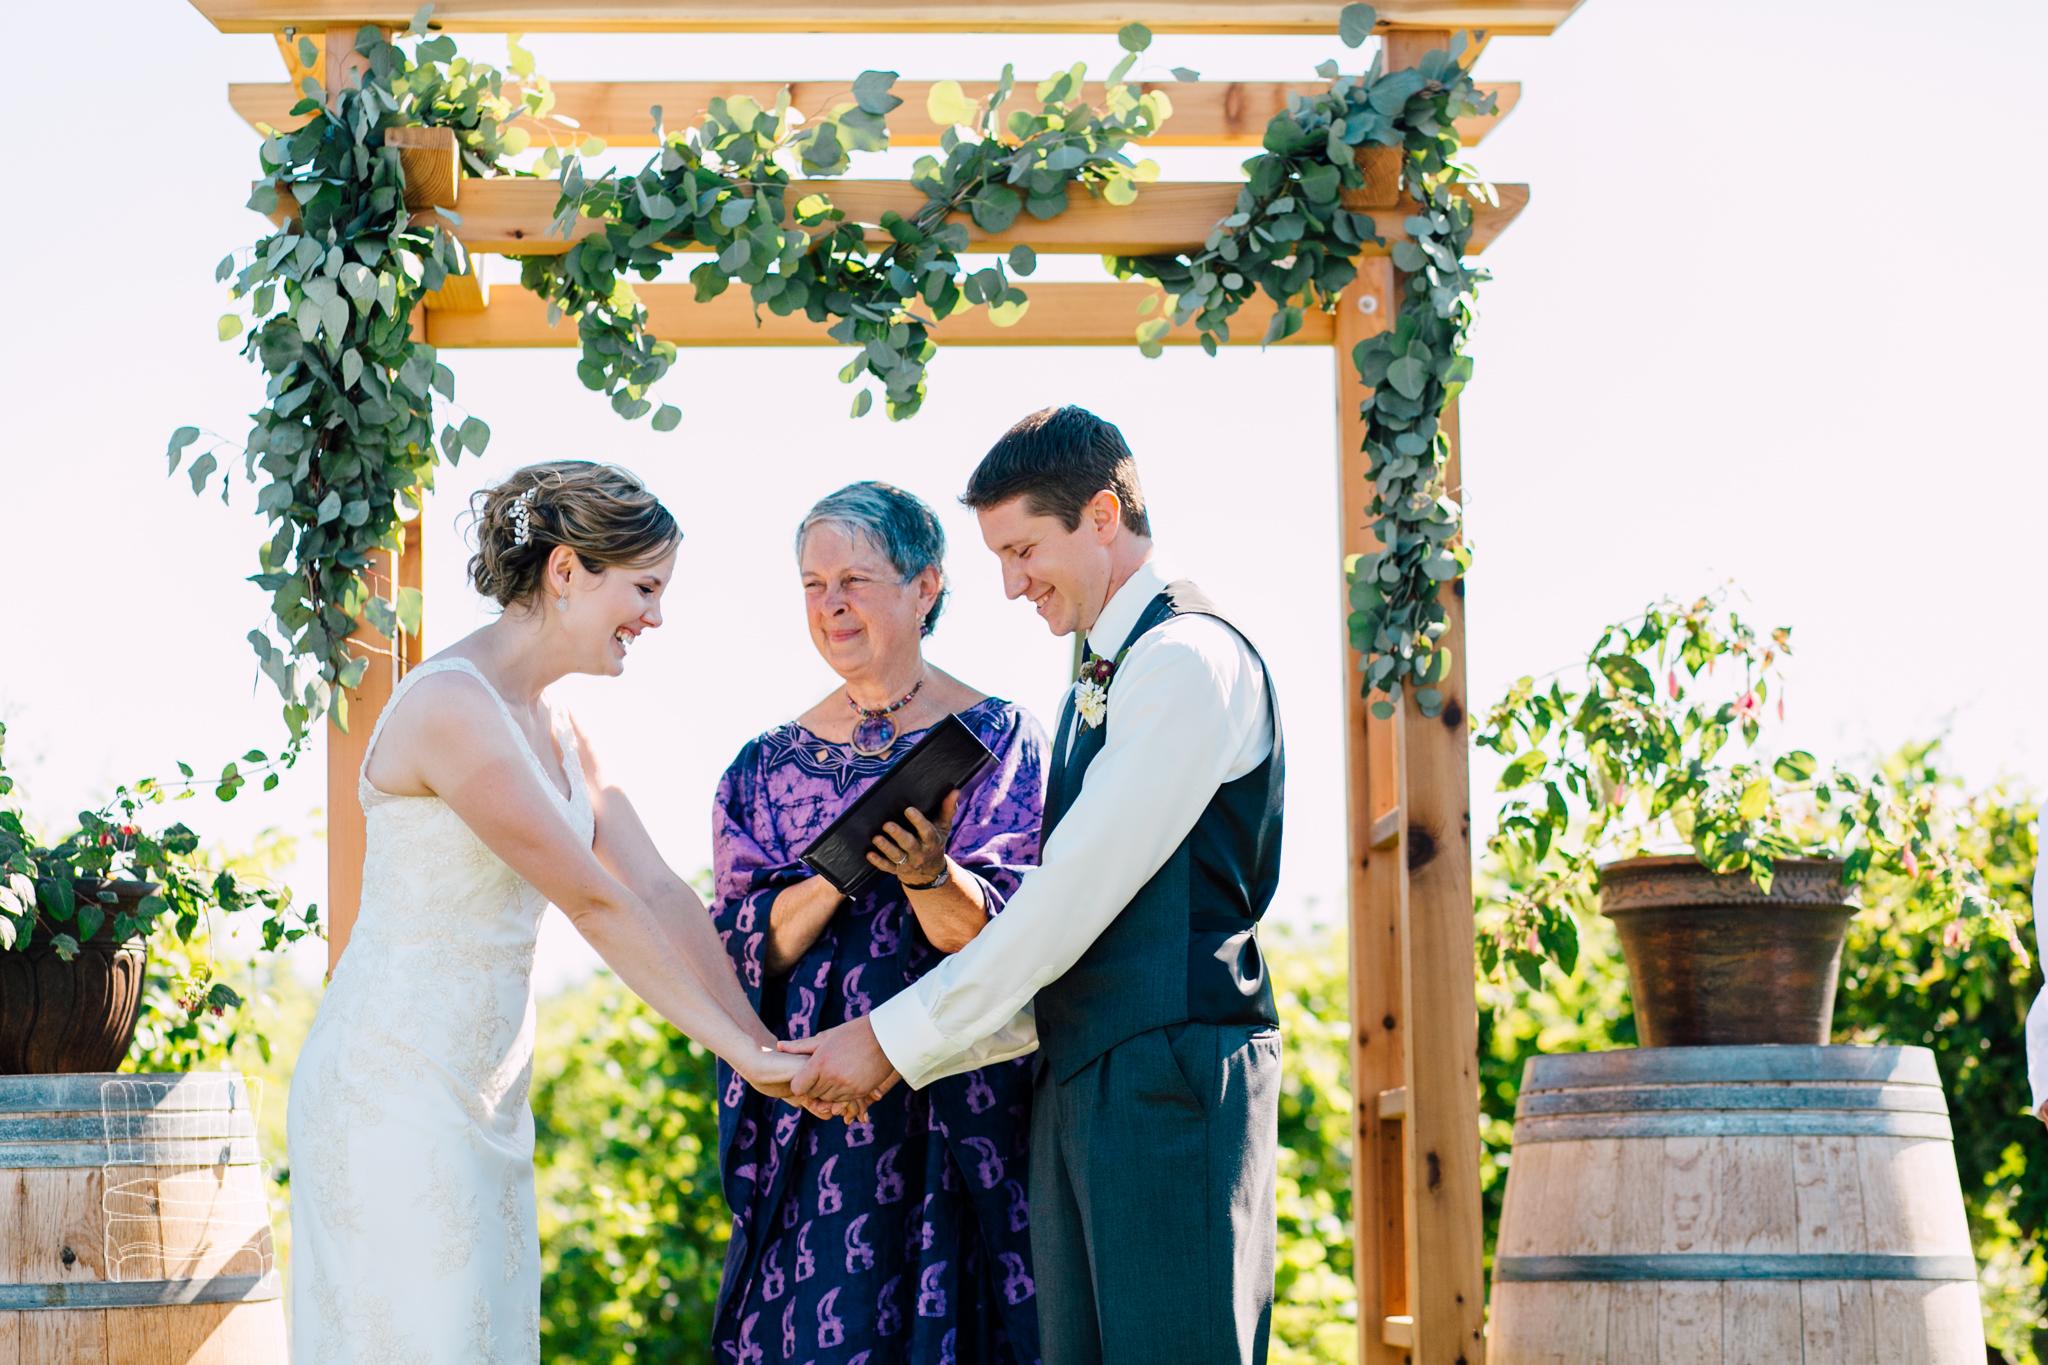 samson-winery-wedding-katheryn-moran-jillmike-1.jpg